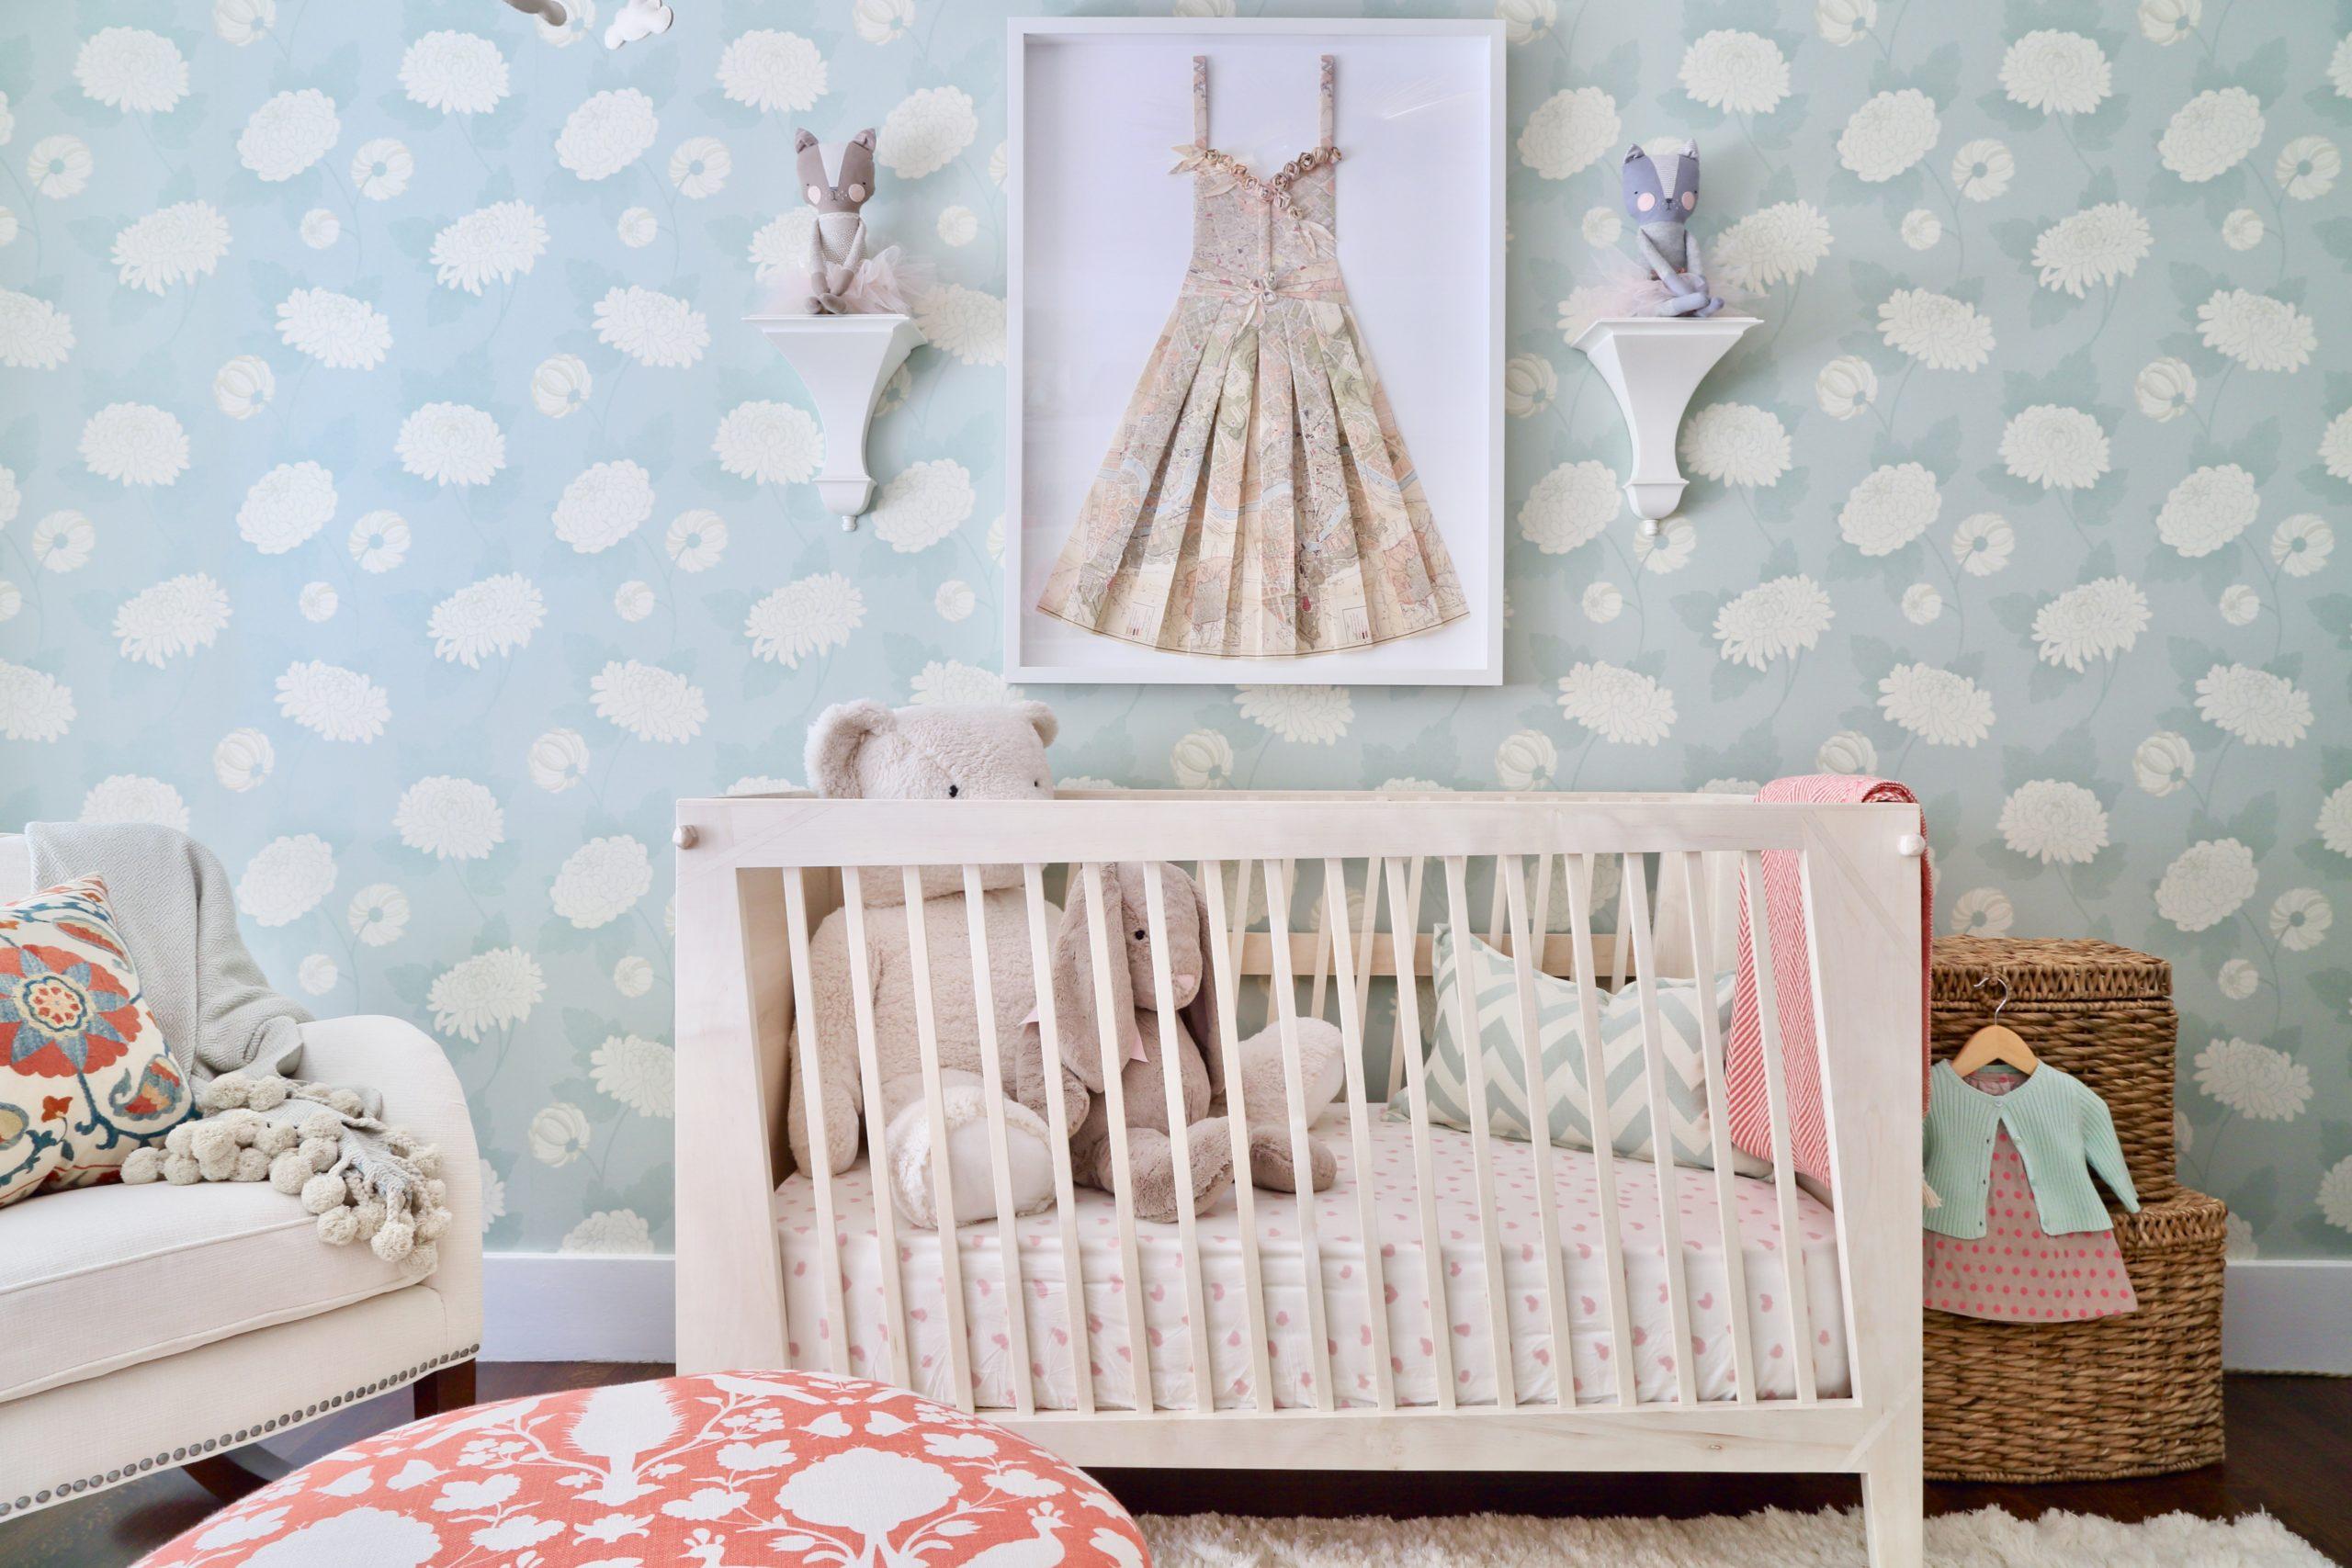 Whimsical Slanted Crib in Girl's Nursery with Folded Dress Art